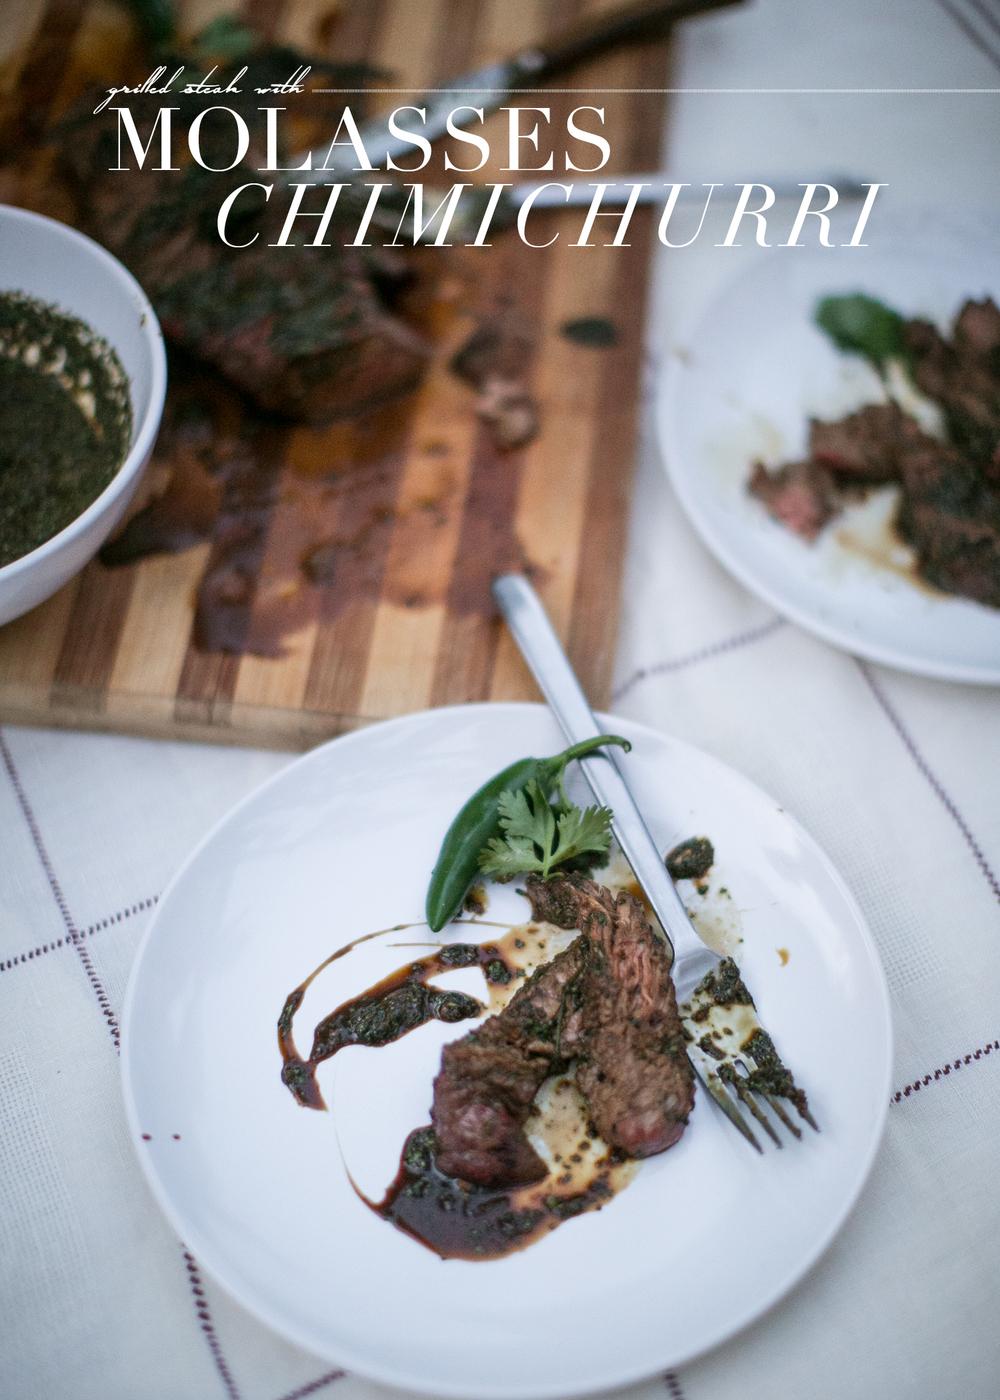 molasses chimicurri with steak